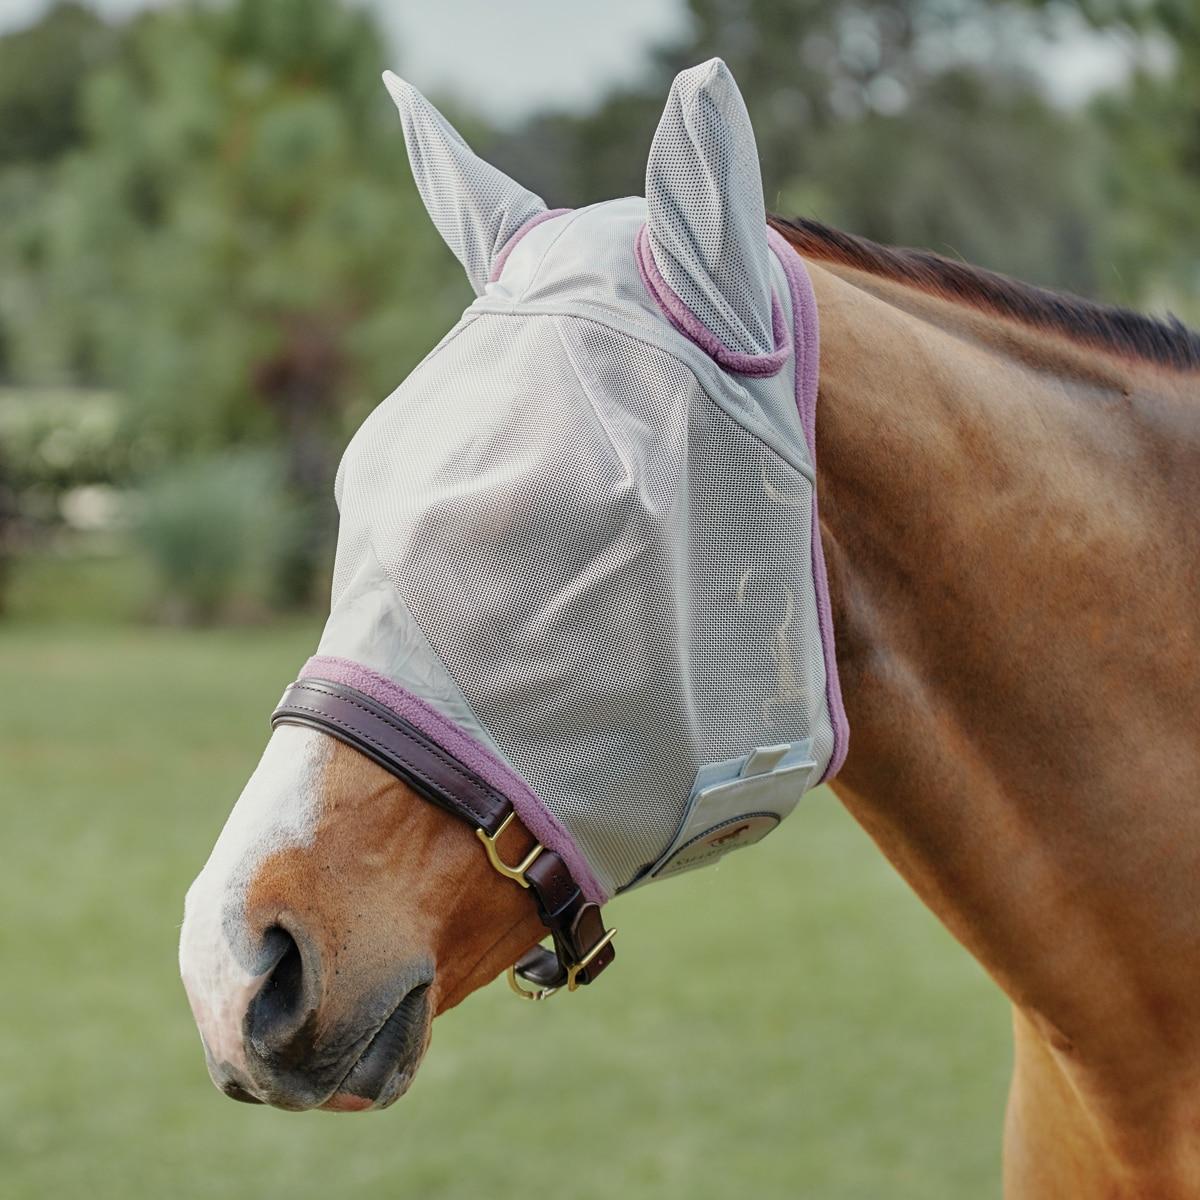 Amigo Fly Mask Durable Comfort Fleece UV Protect Breathable Horse Pony Equine